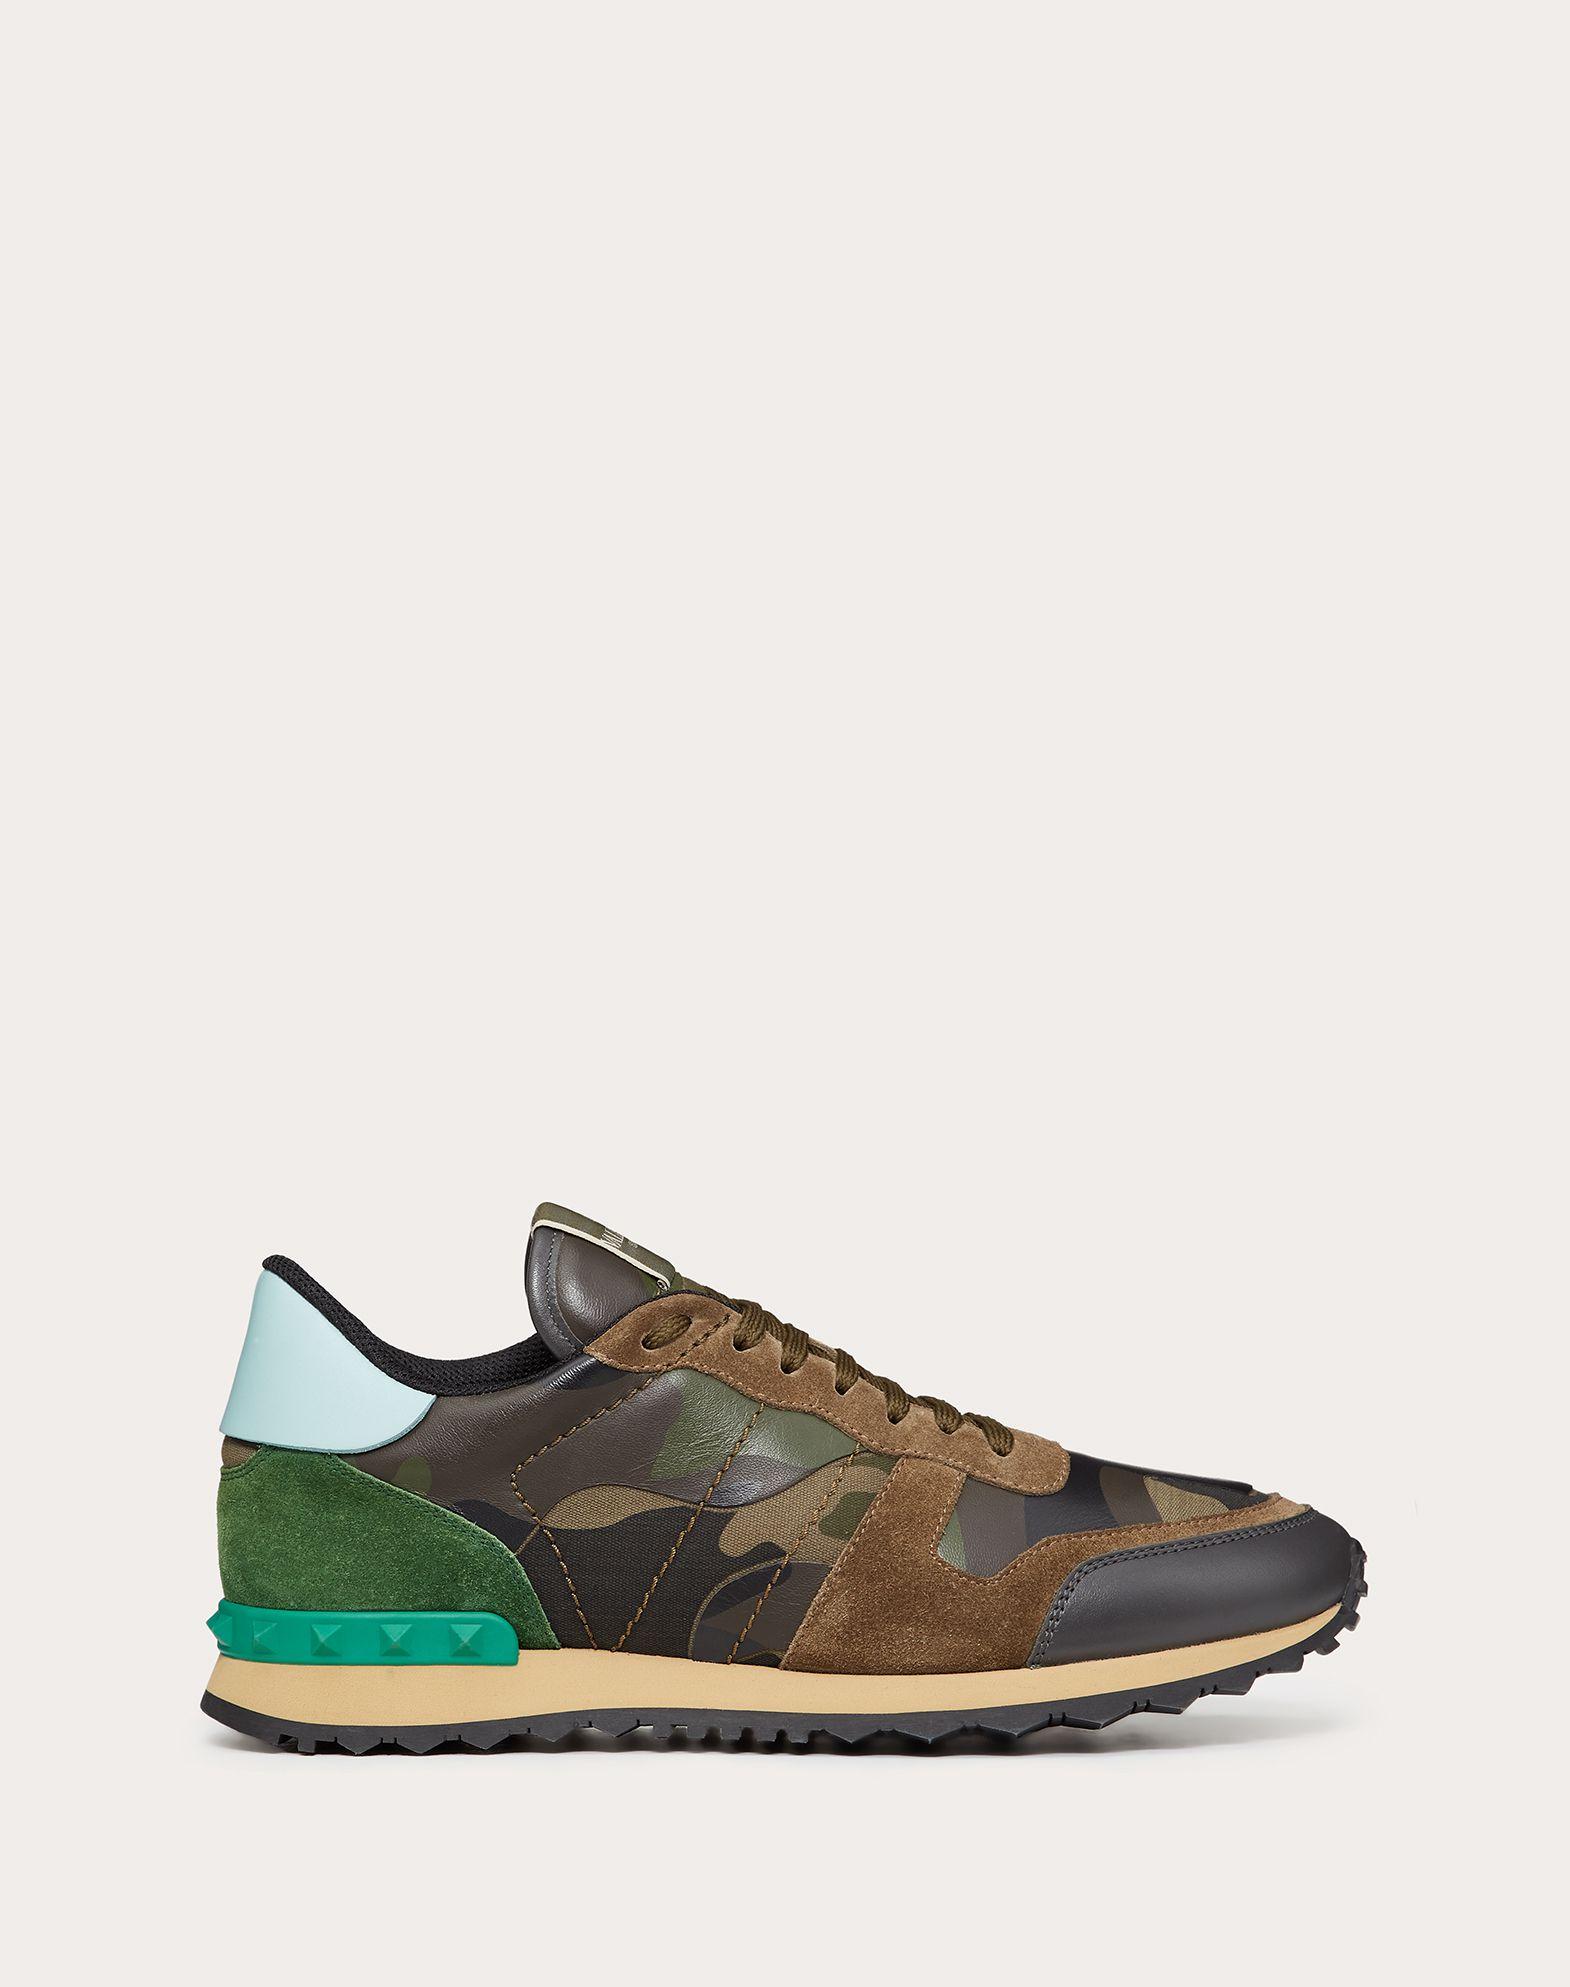 VALENTINO GARAVANI UOMO Sneaker Rockrunner Camouflage LOW-TOP SNEAKERS U f